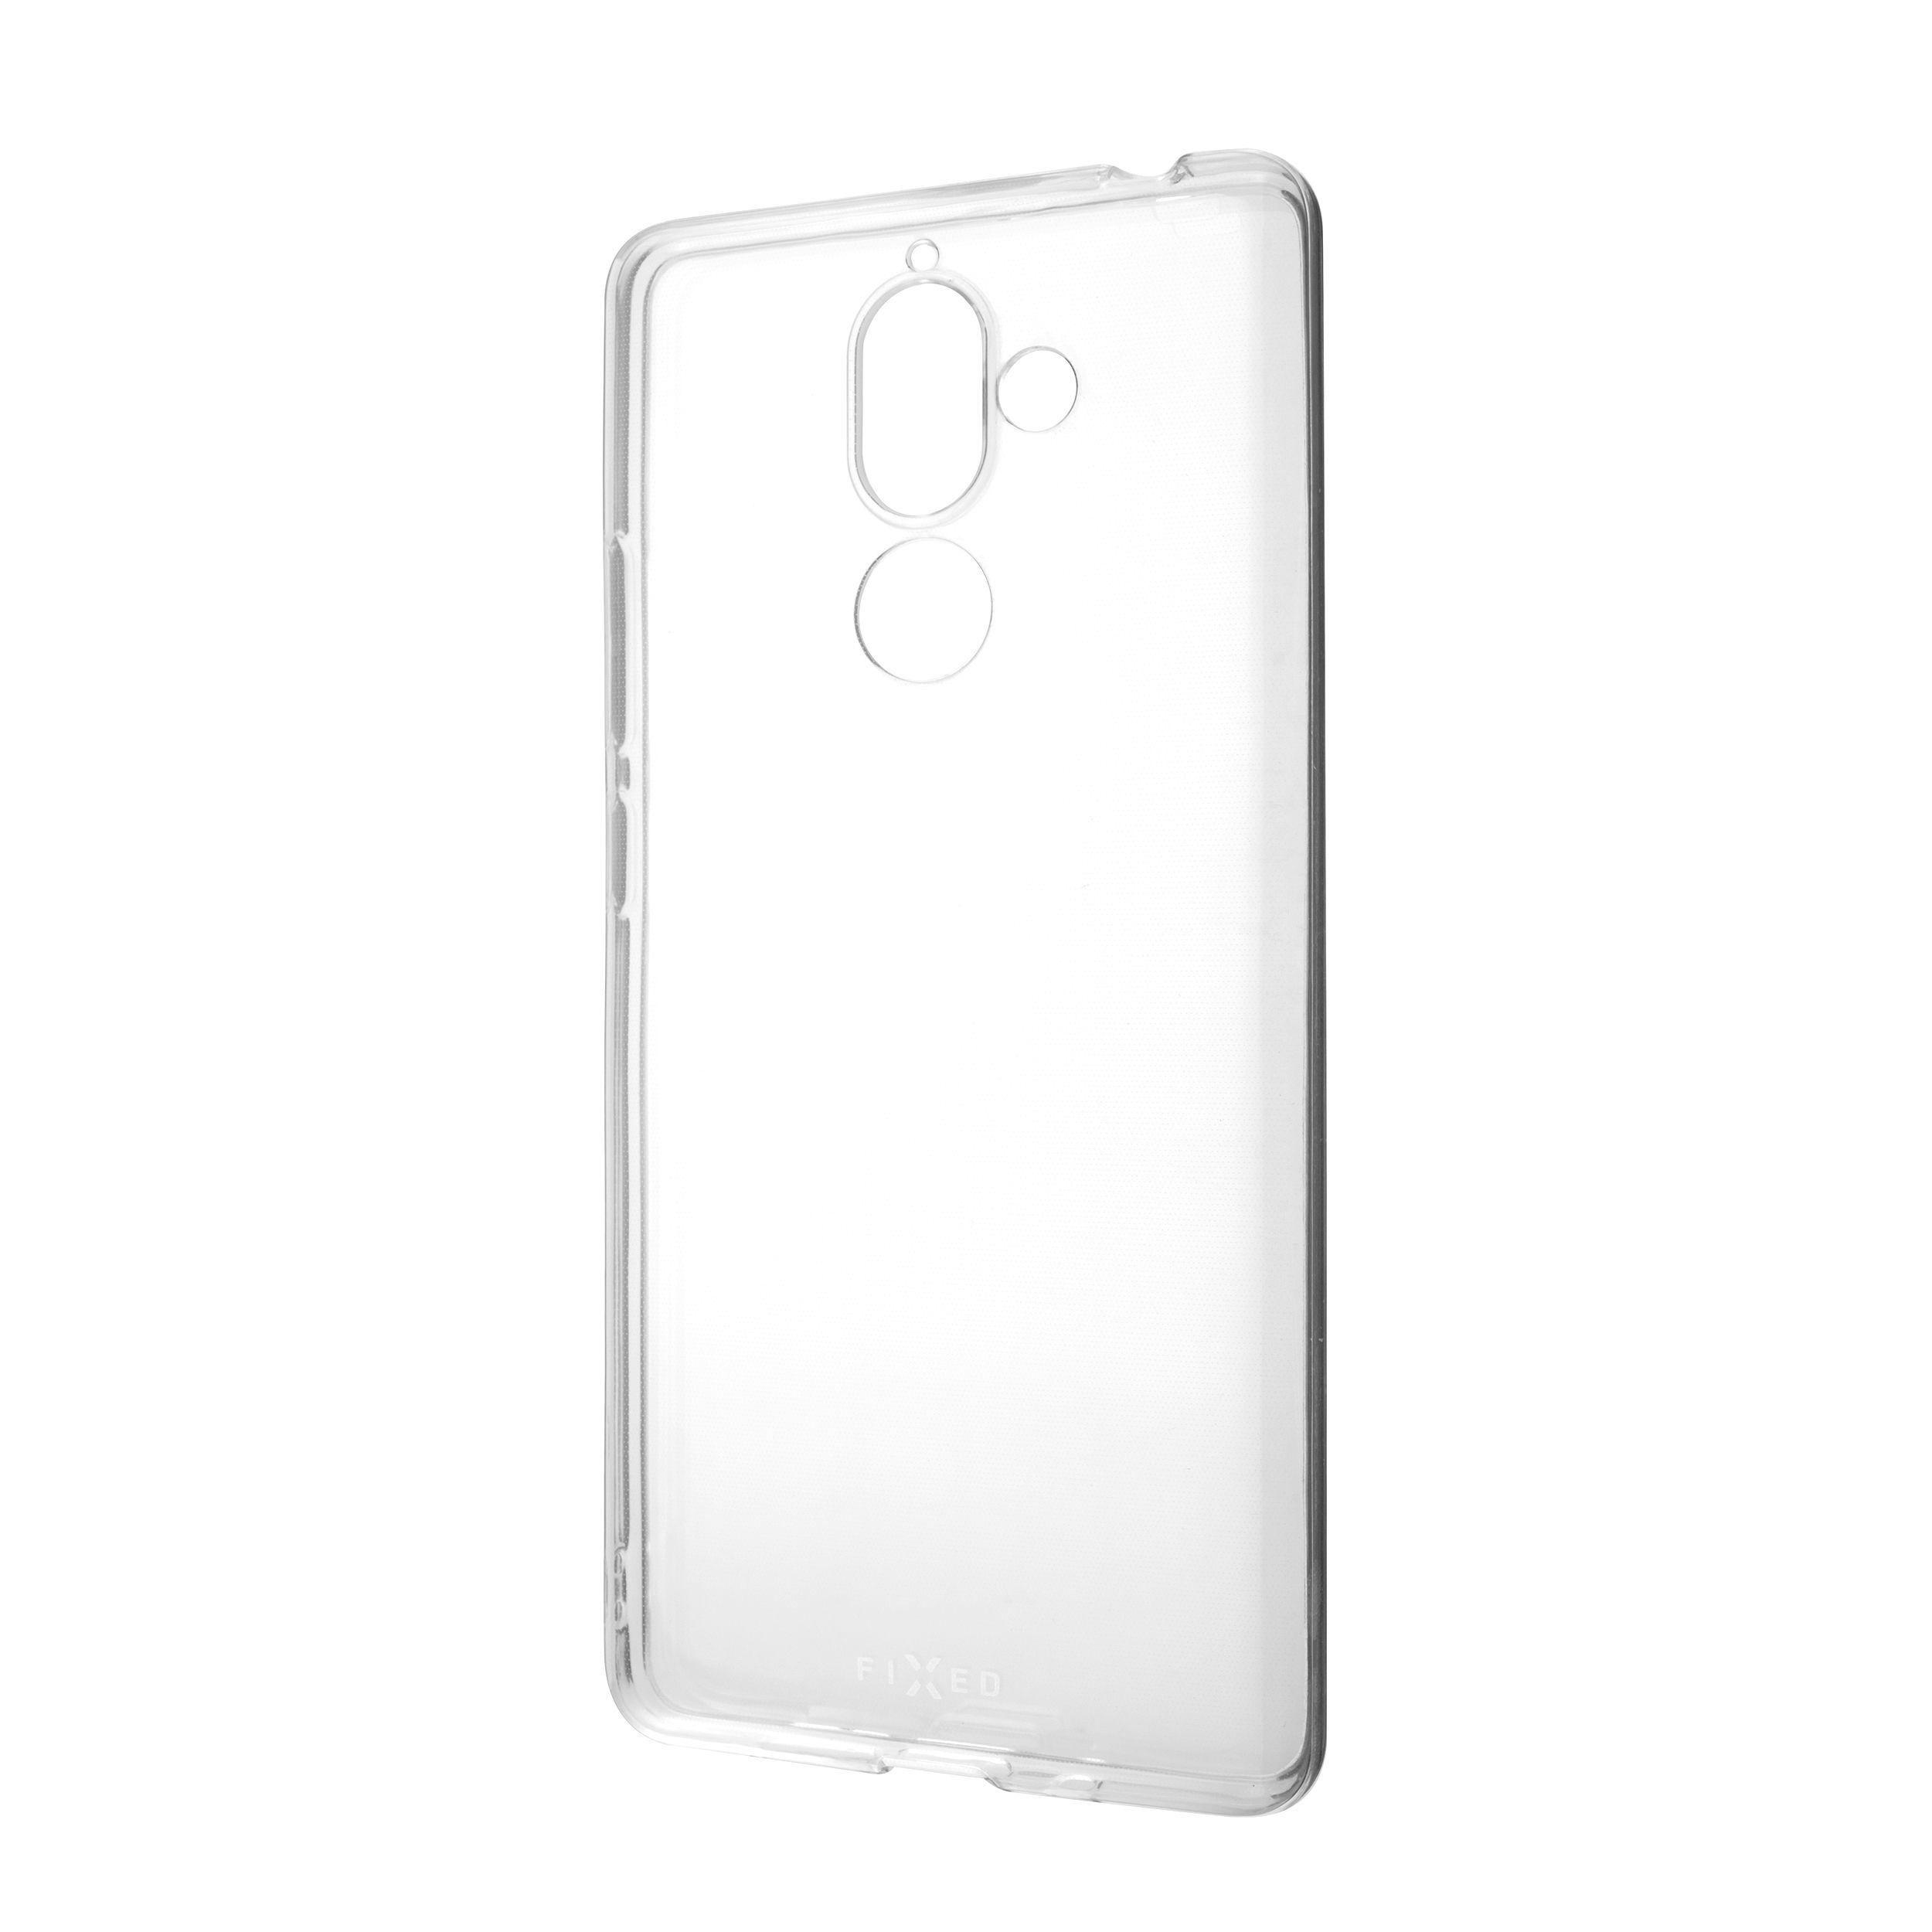 FIXED Skin ultratenké pouzdro pro Nokia 7 Plus, čiré